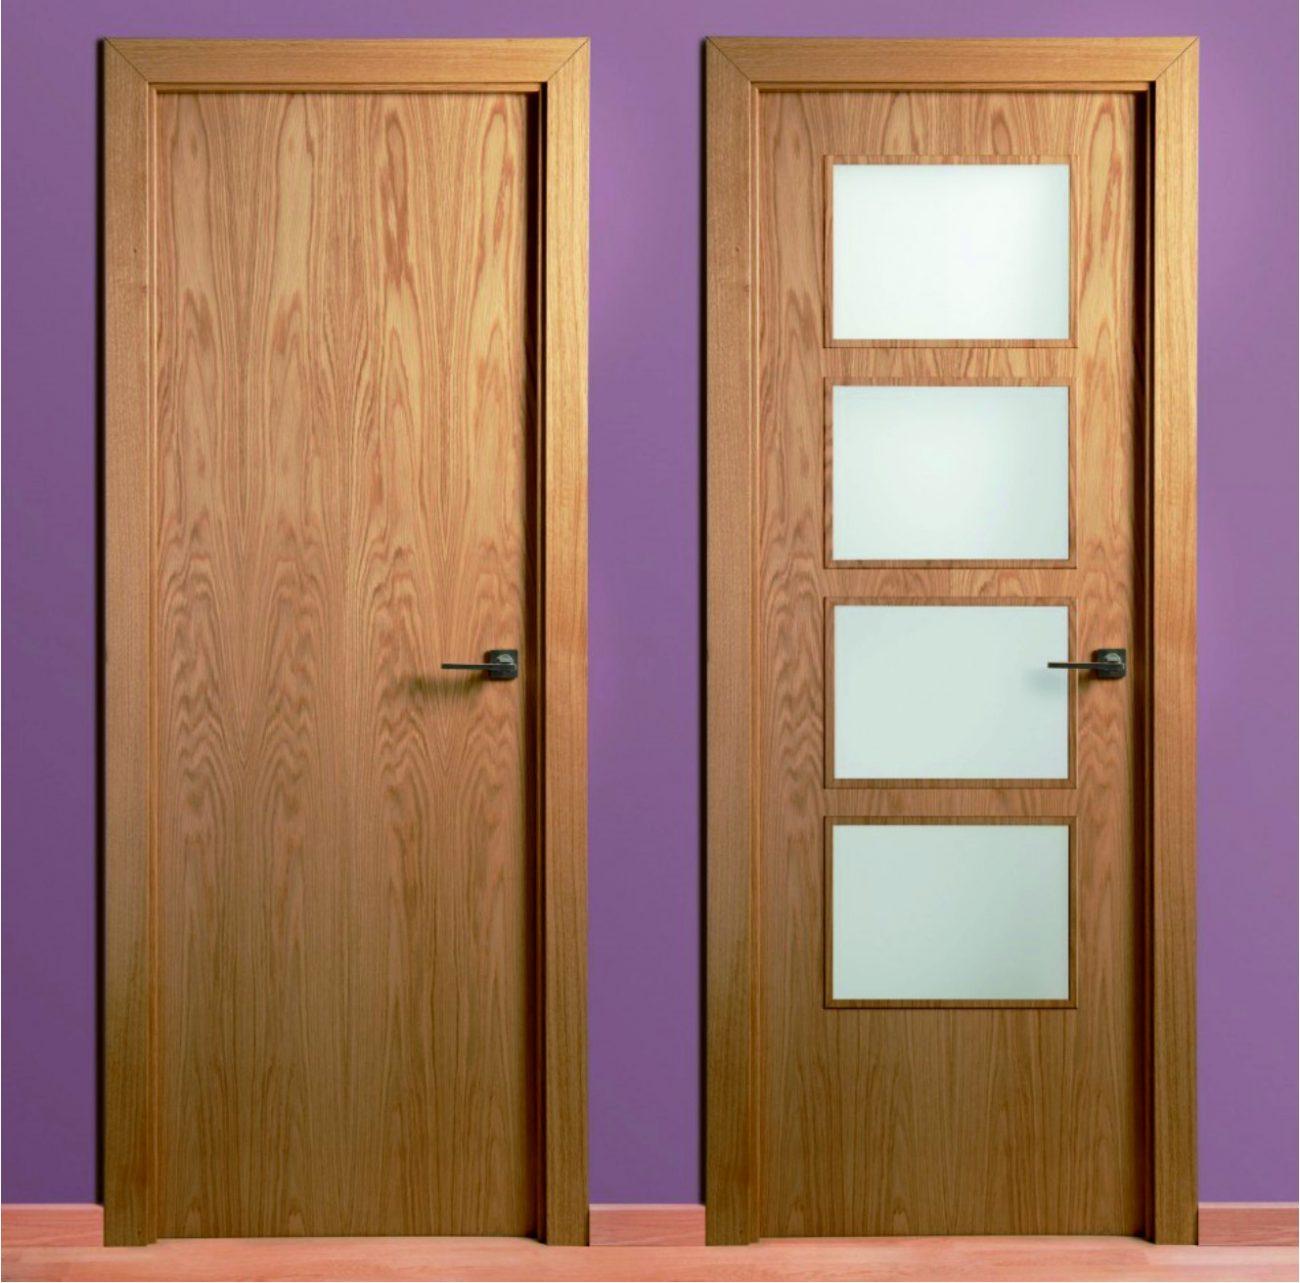 Puerta de madera roble lisa cat logo maderas acu a for Precio puerta roble